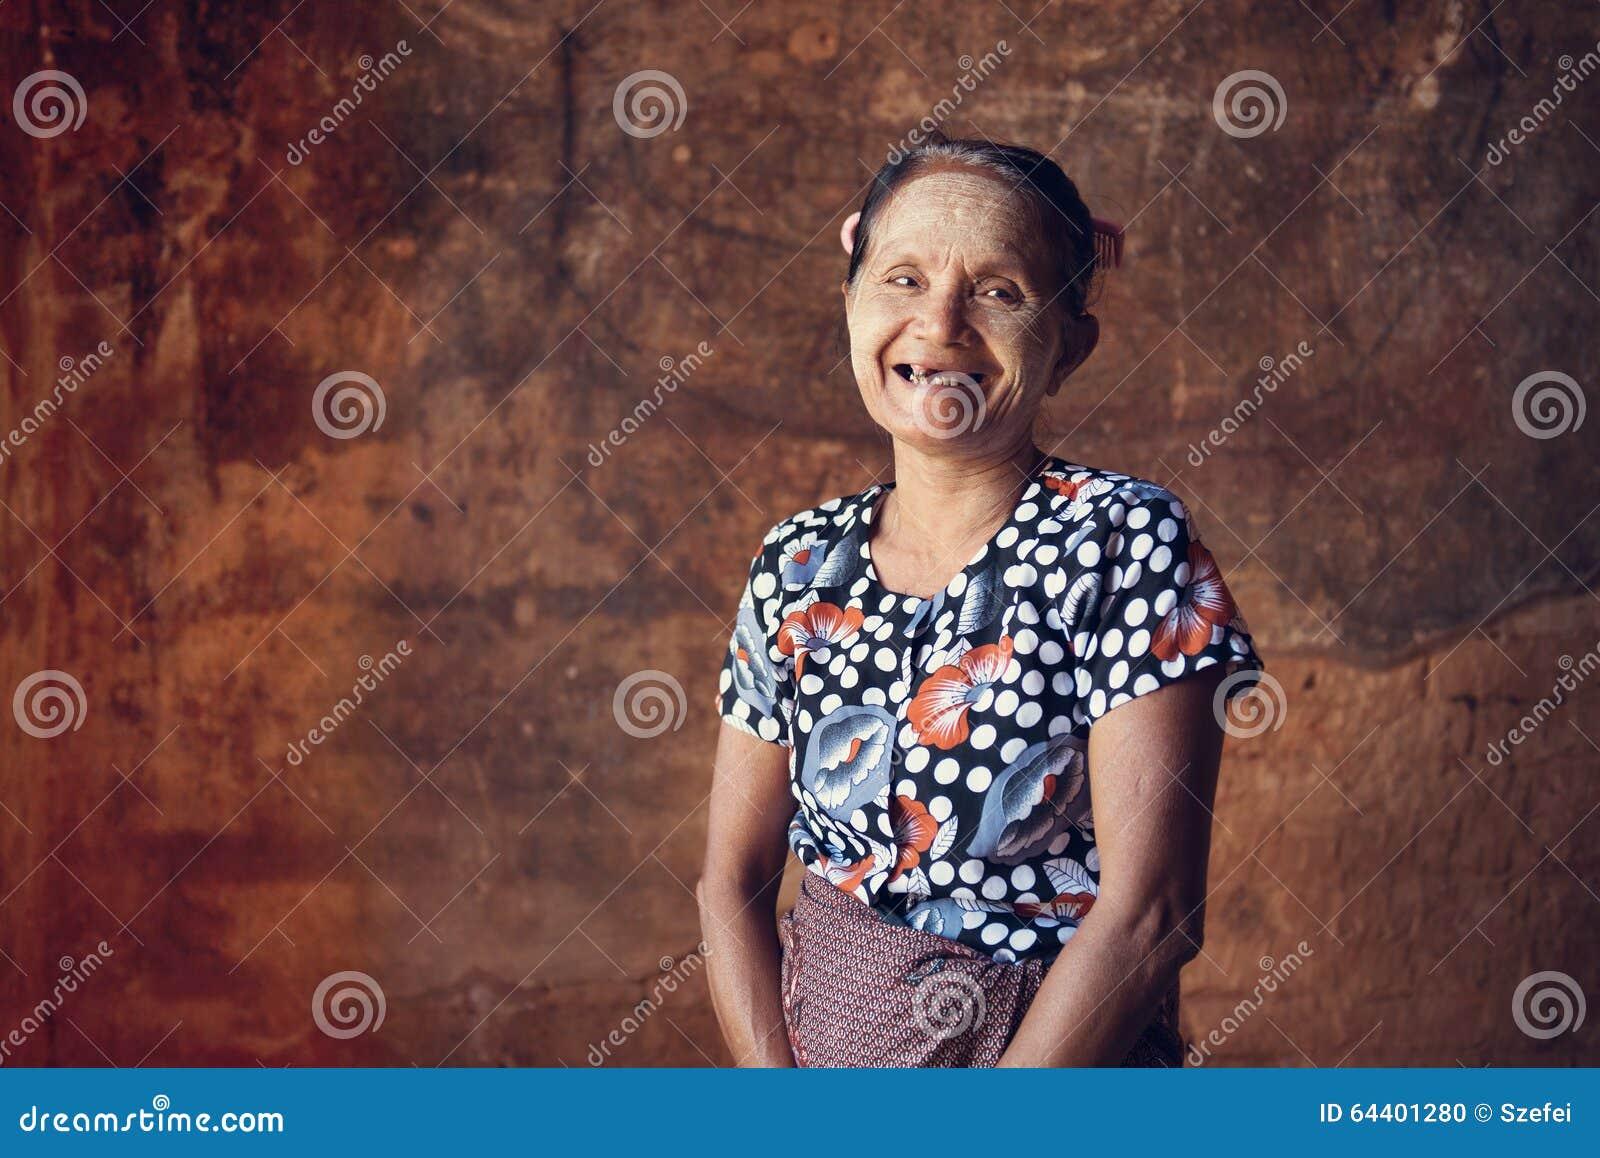 Asian Burmese woman portrait